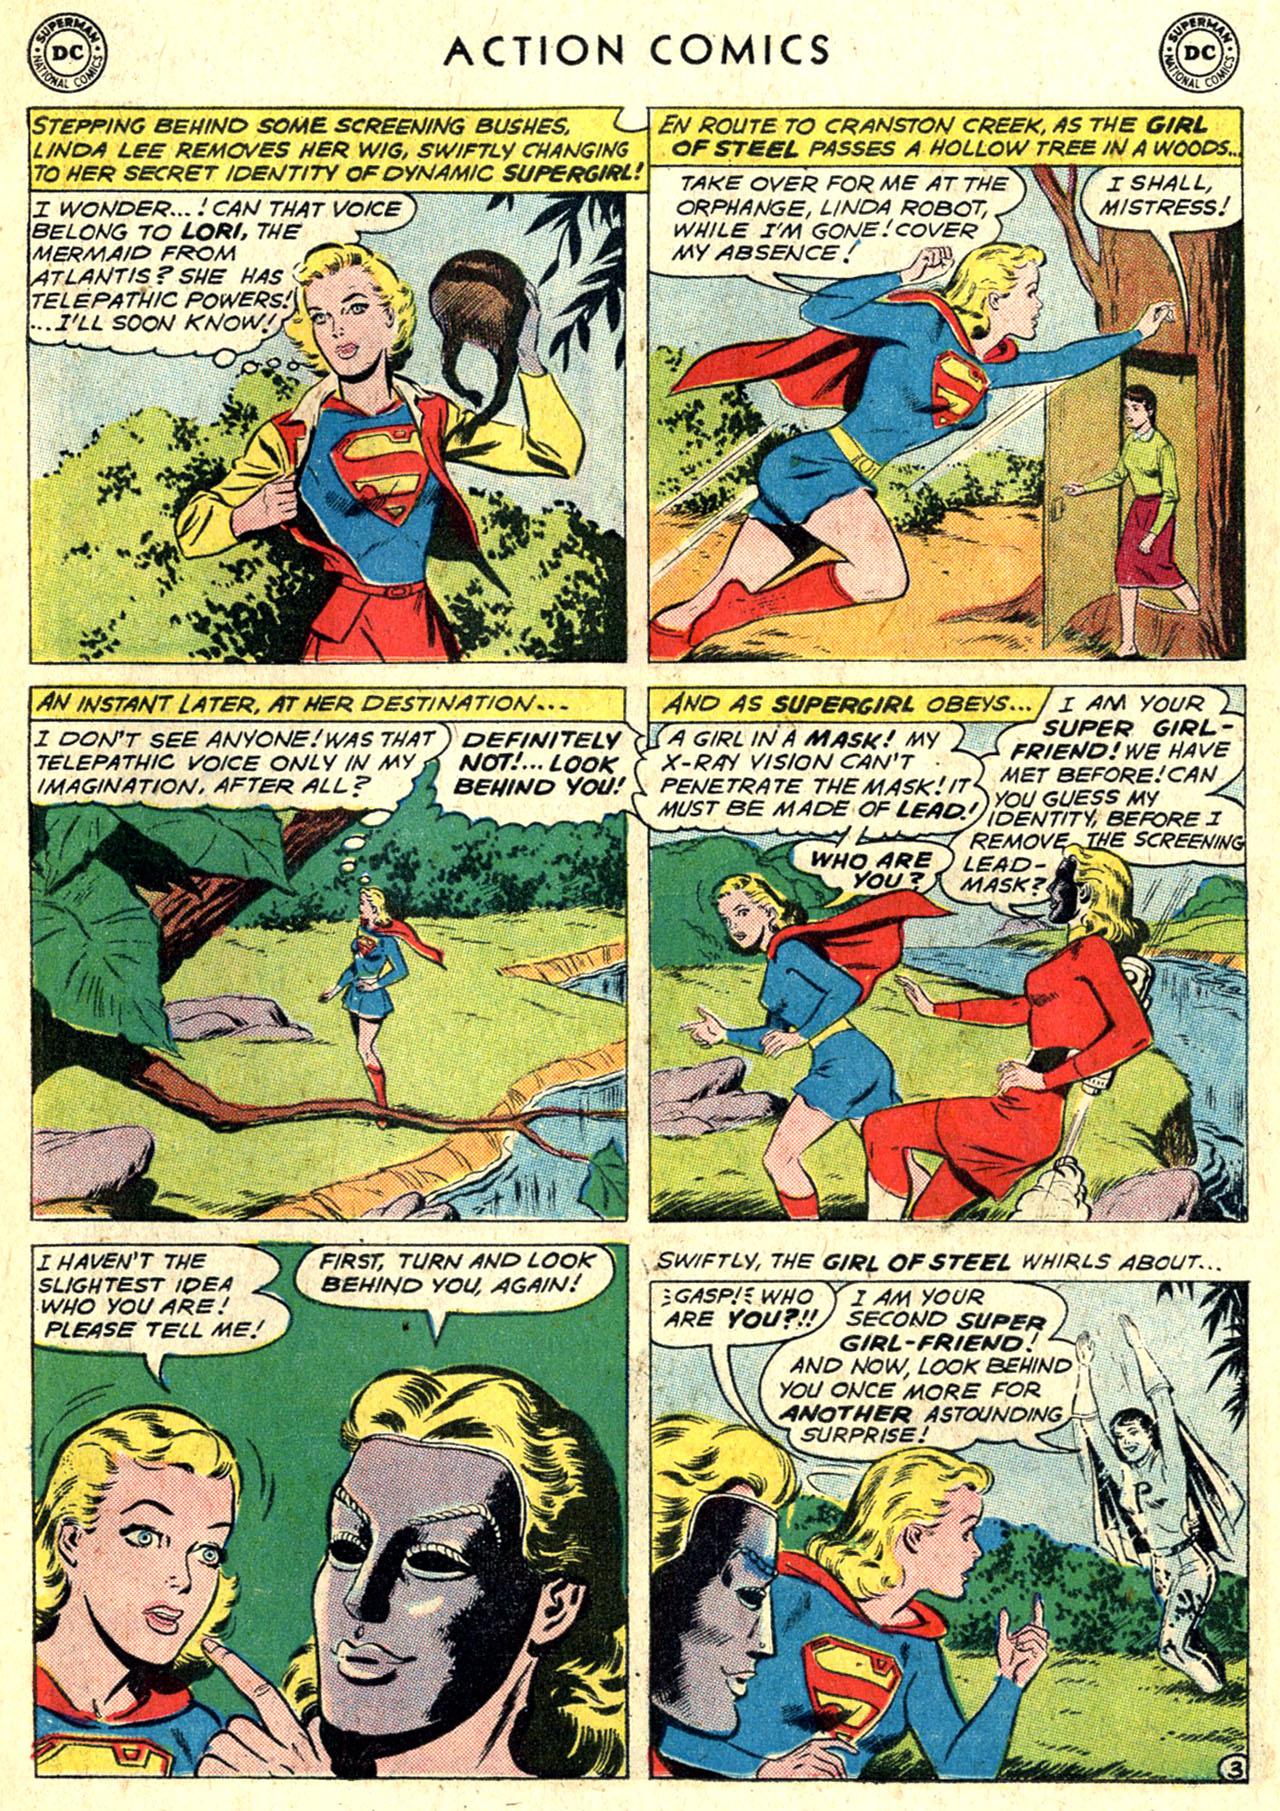 Action Comics (1938) 276 Page 21